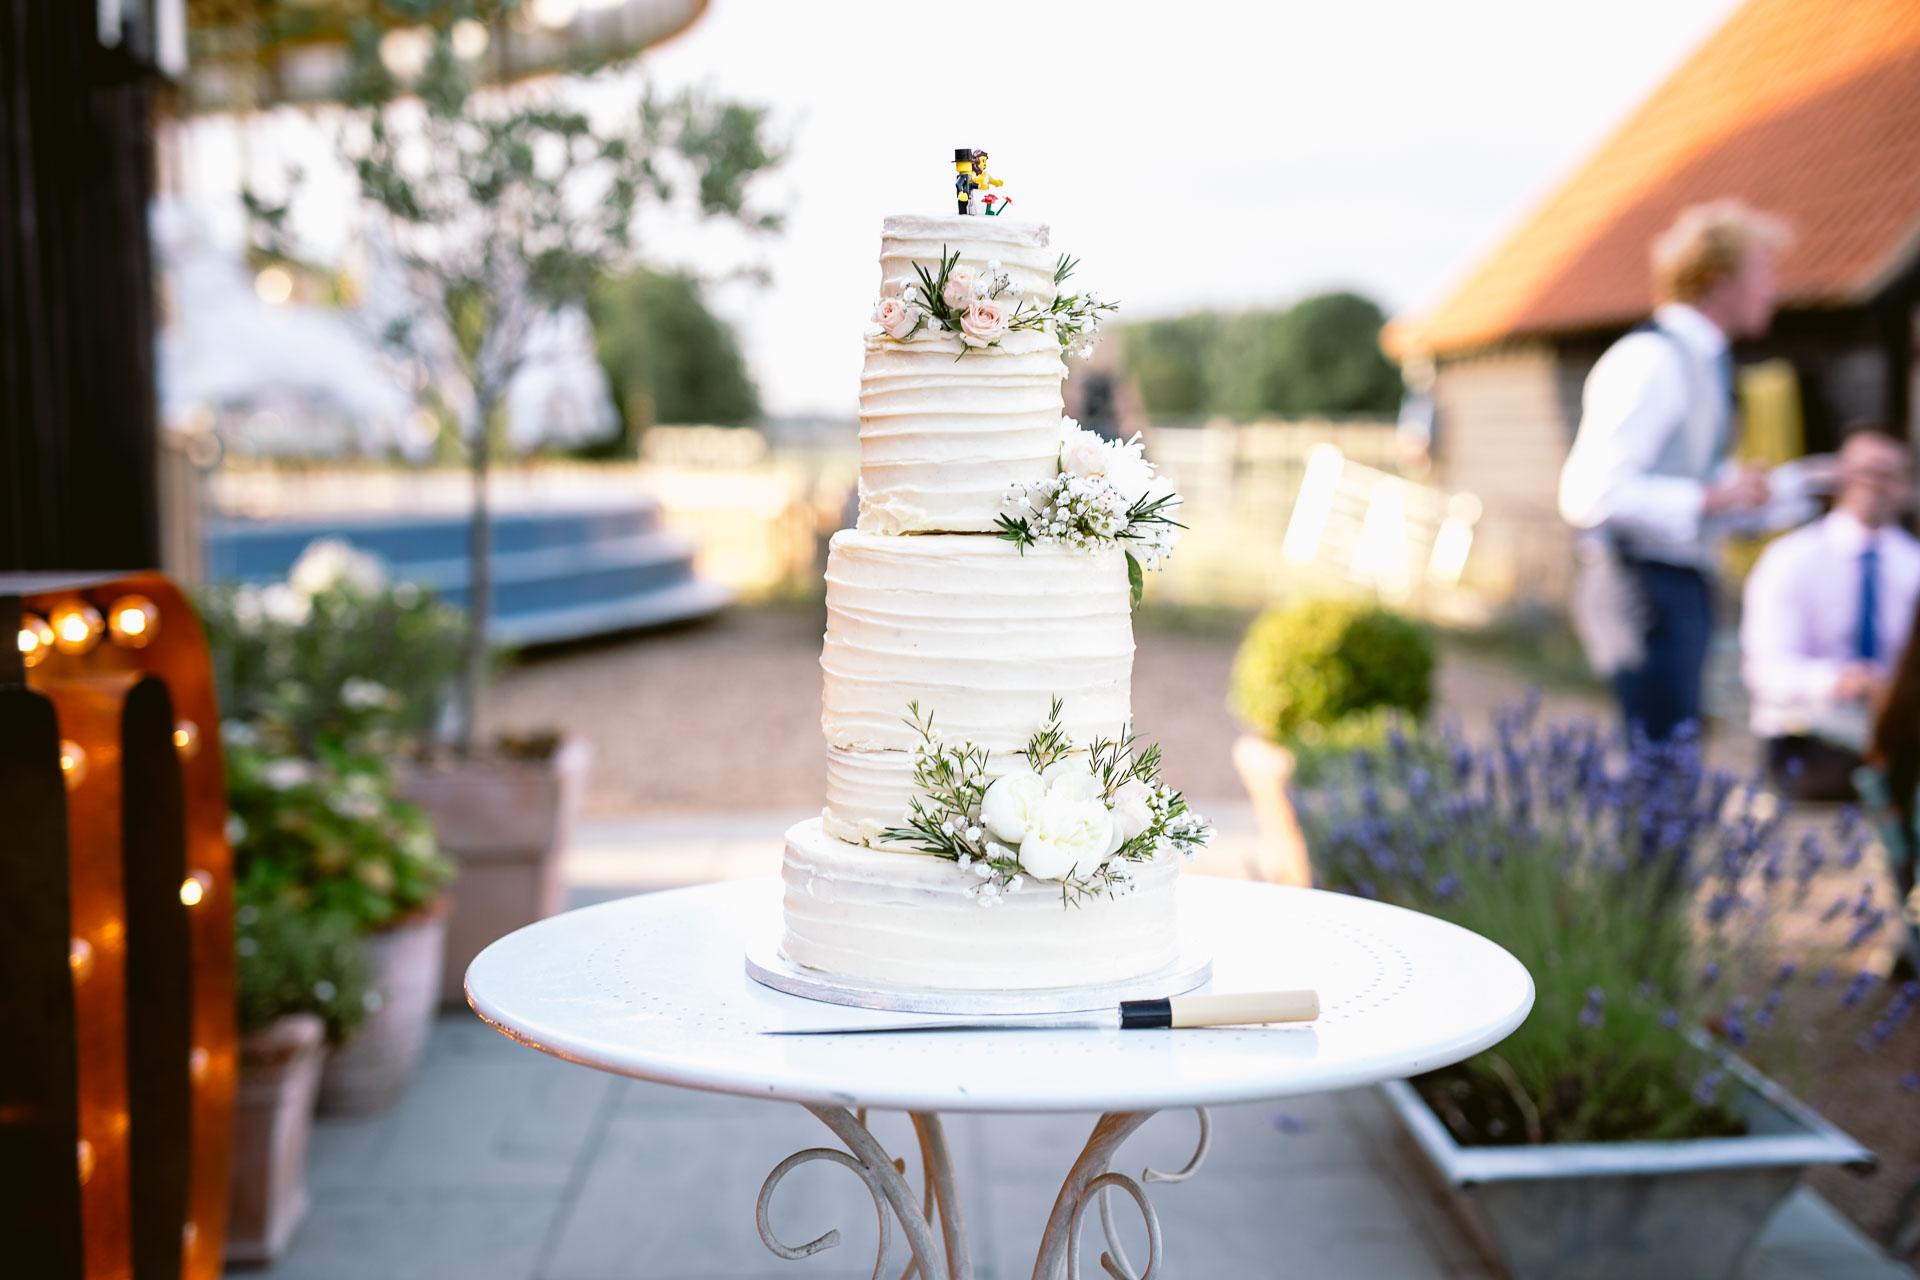 preston court boho wedding alexia and dan wedding cake look on the table outside of the venue